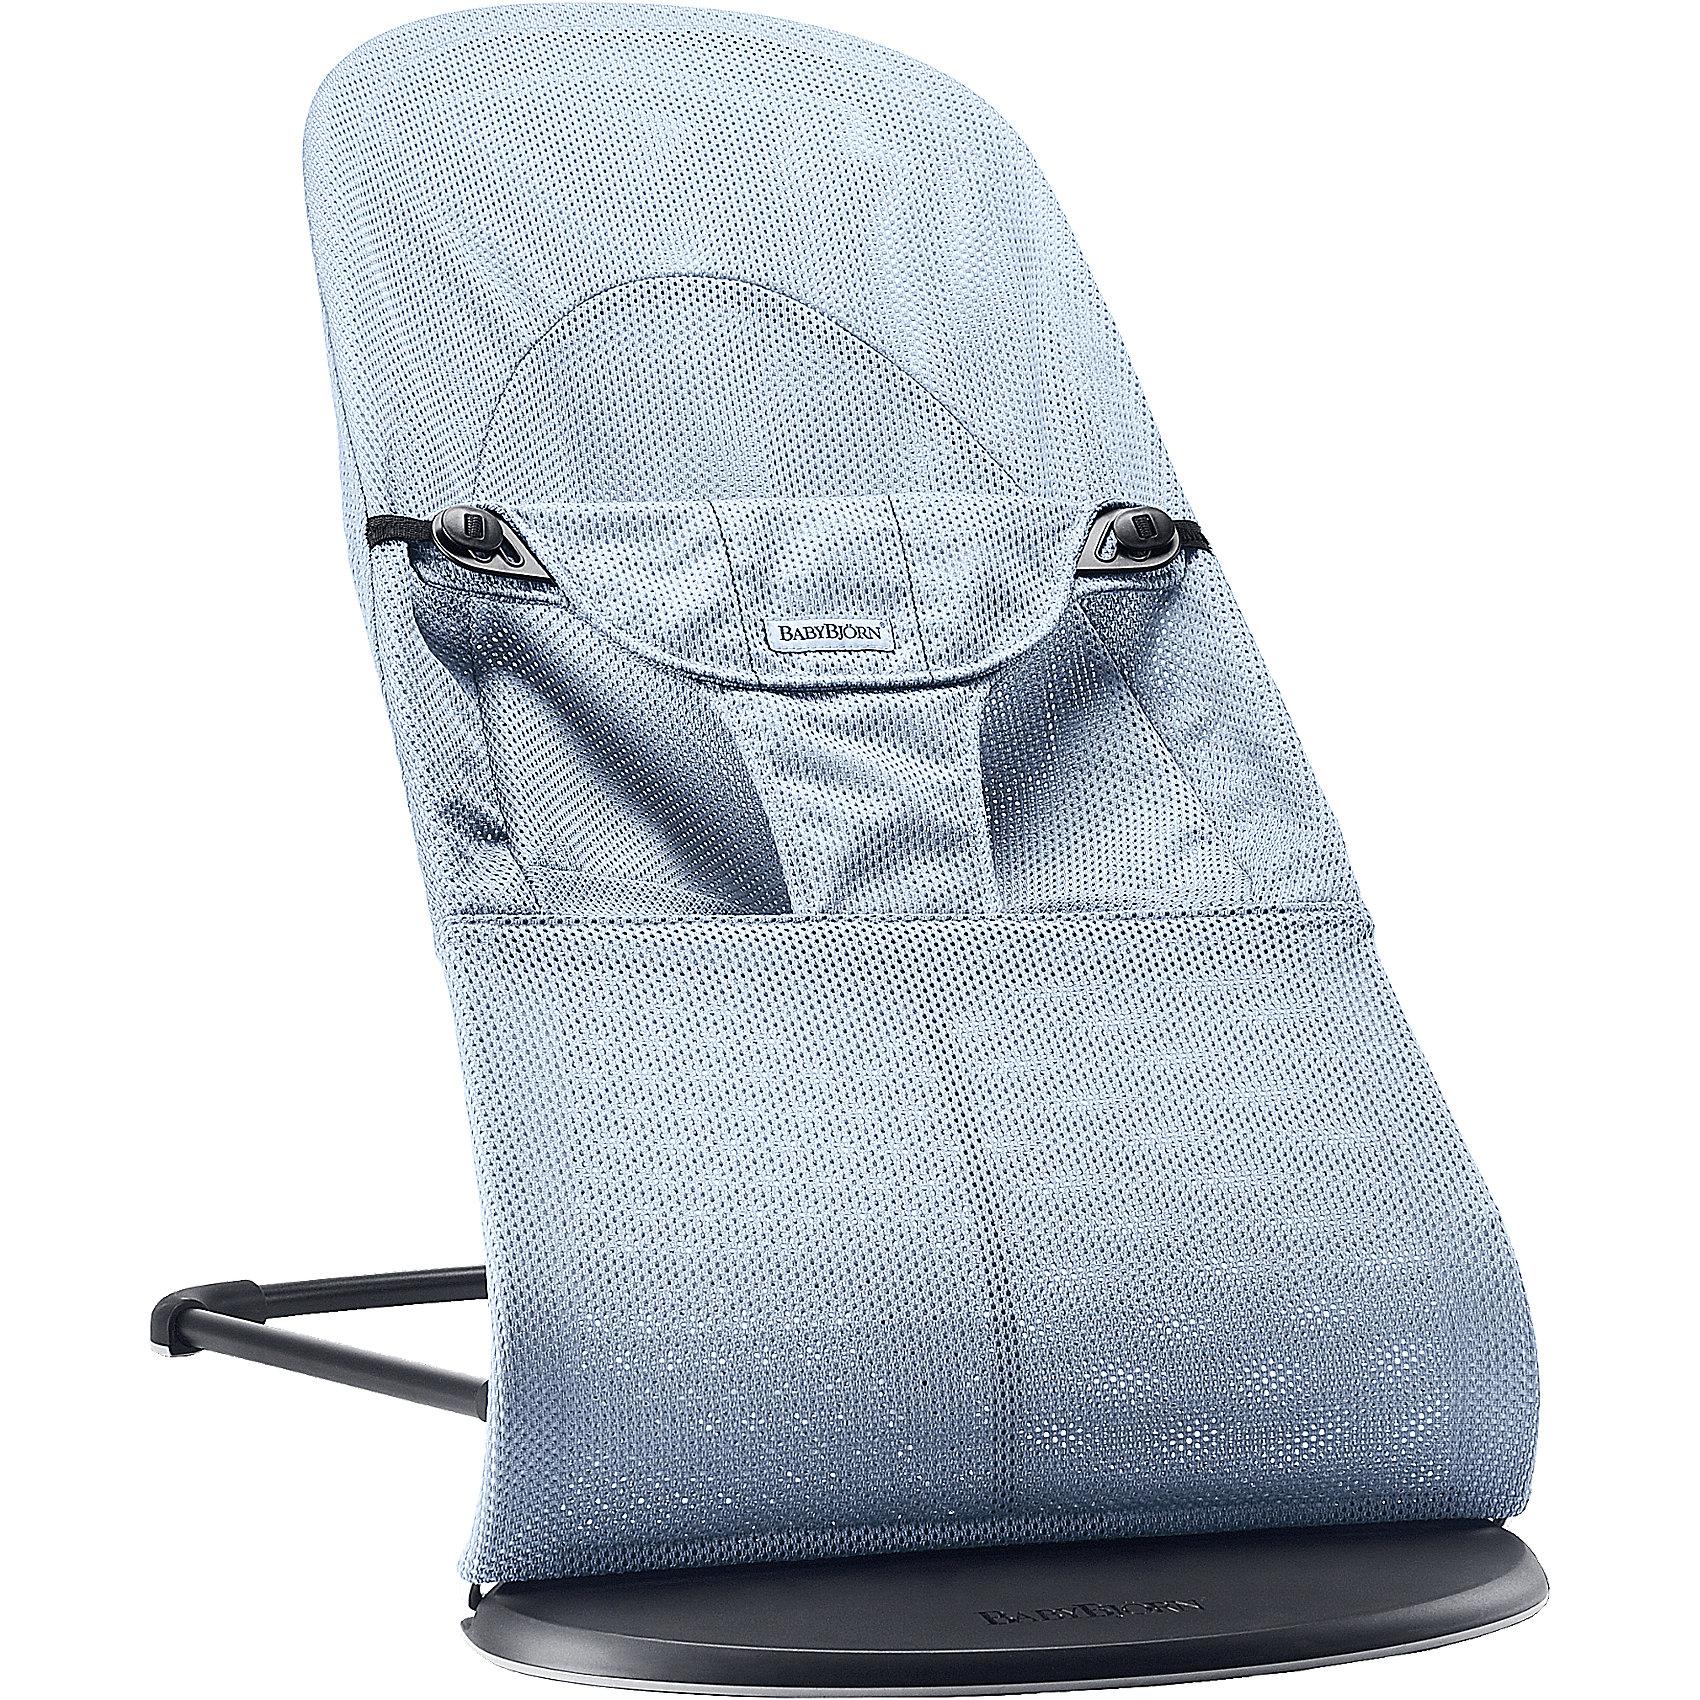 BabyBjorn Кресло-шезлонг Balance Soft Air, BabyBjorn, голубой кресла качалки шезлонги babybjorn кресло шезлонг bliss mesh